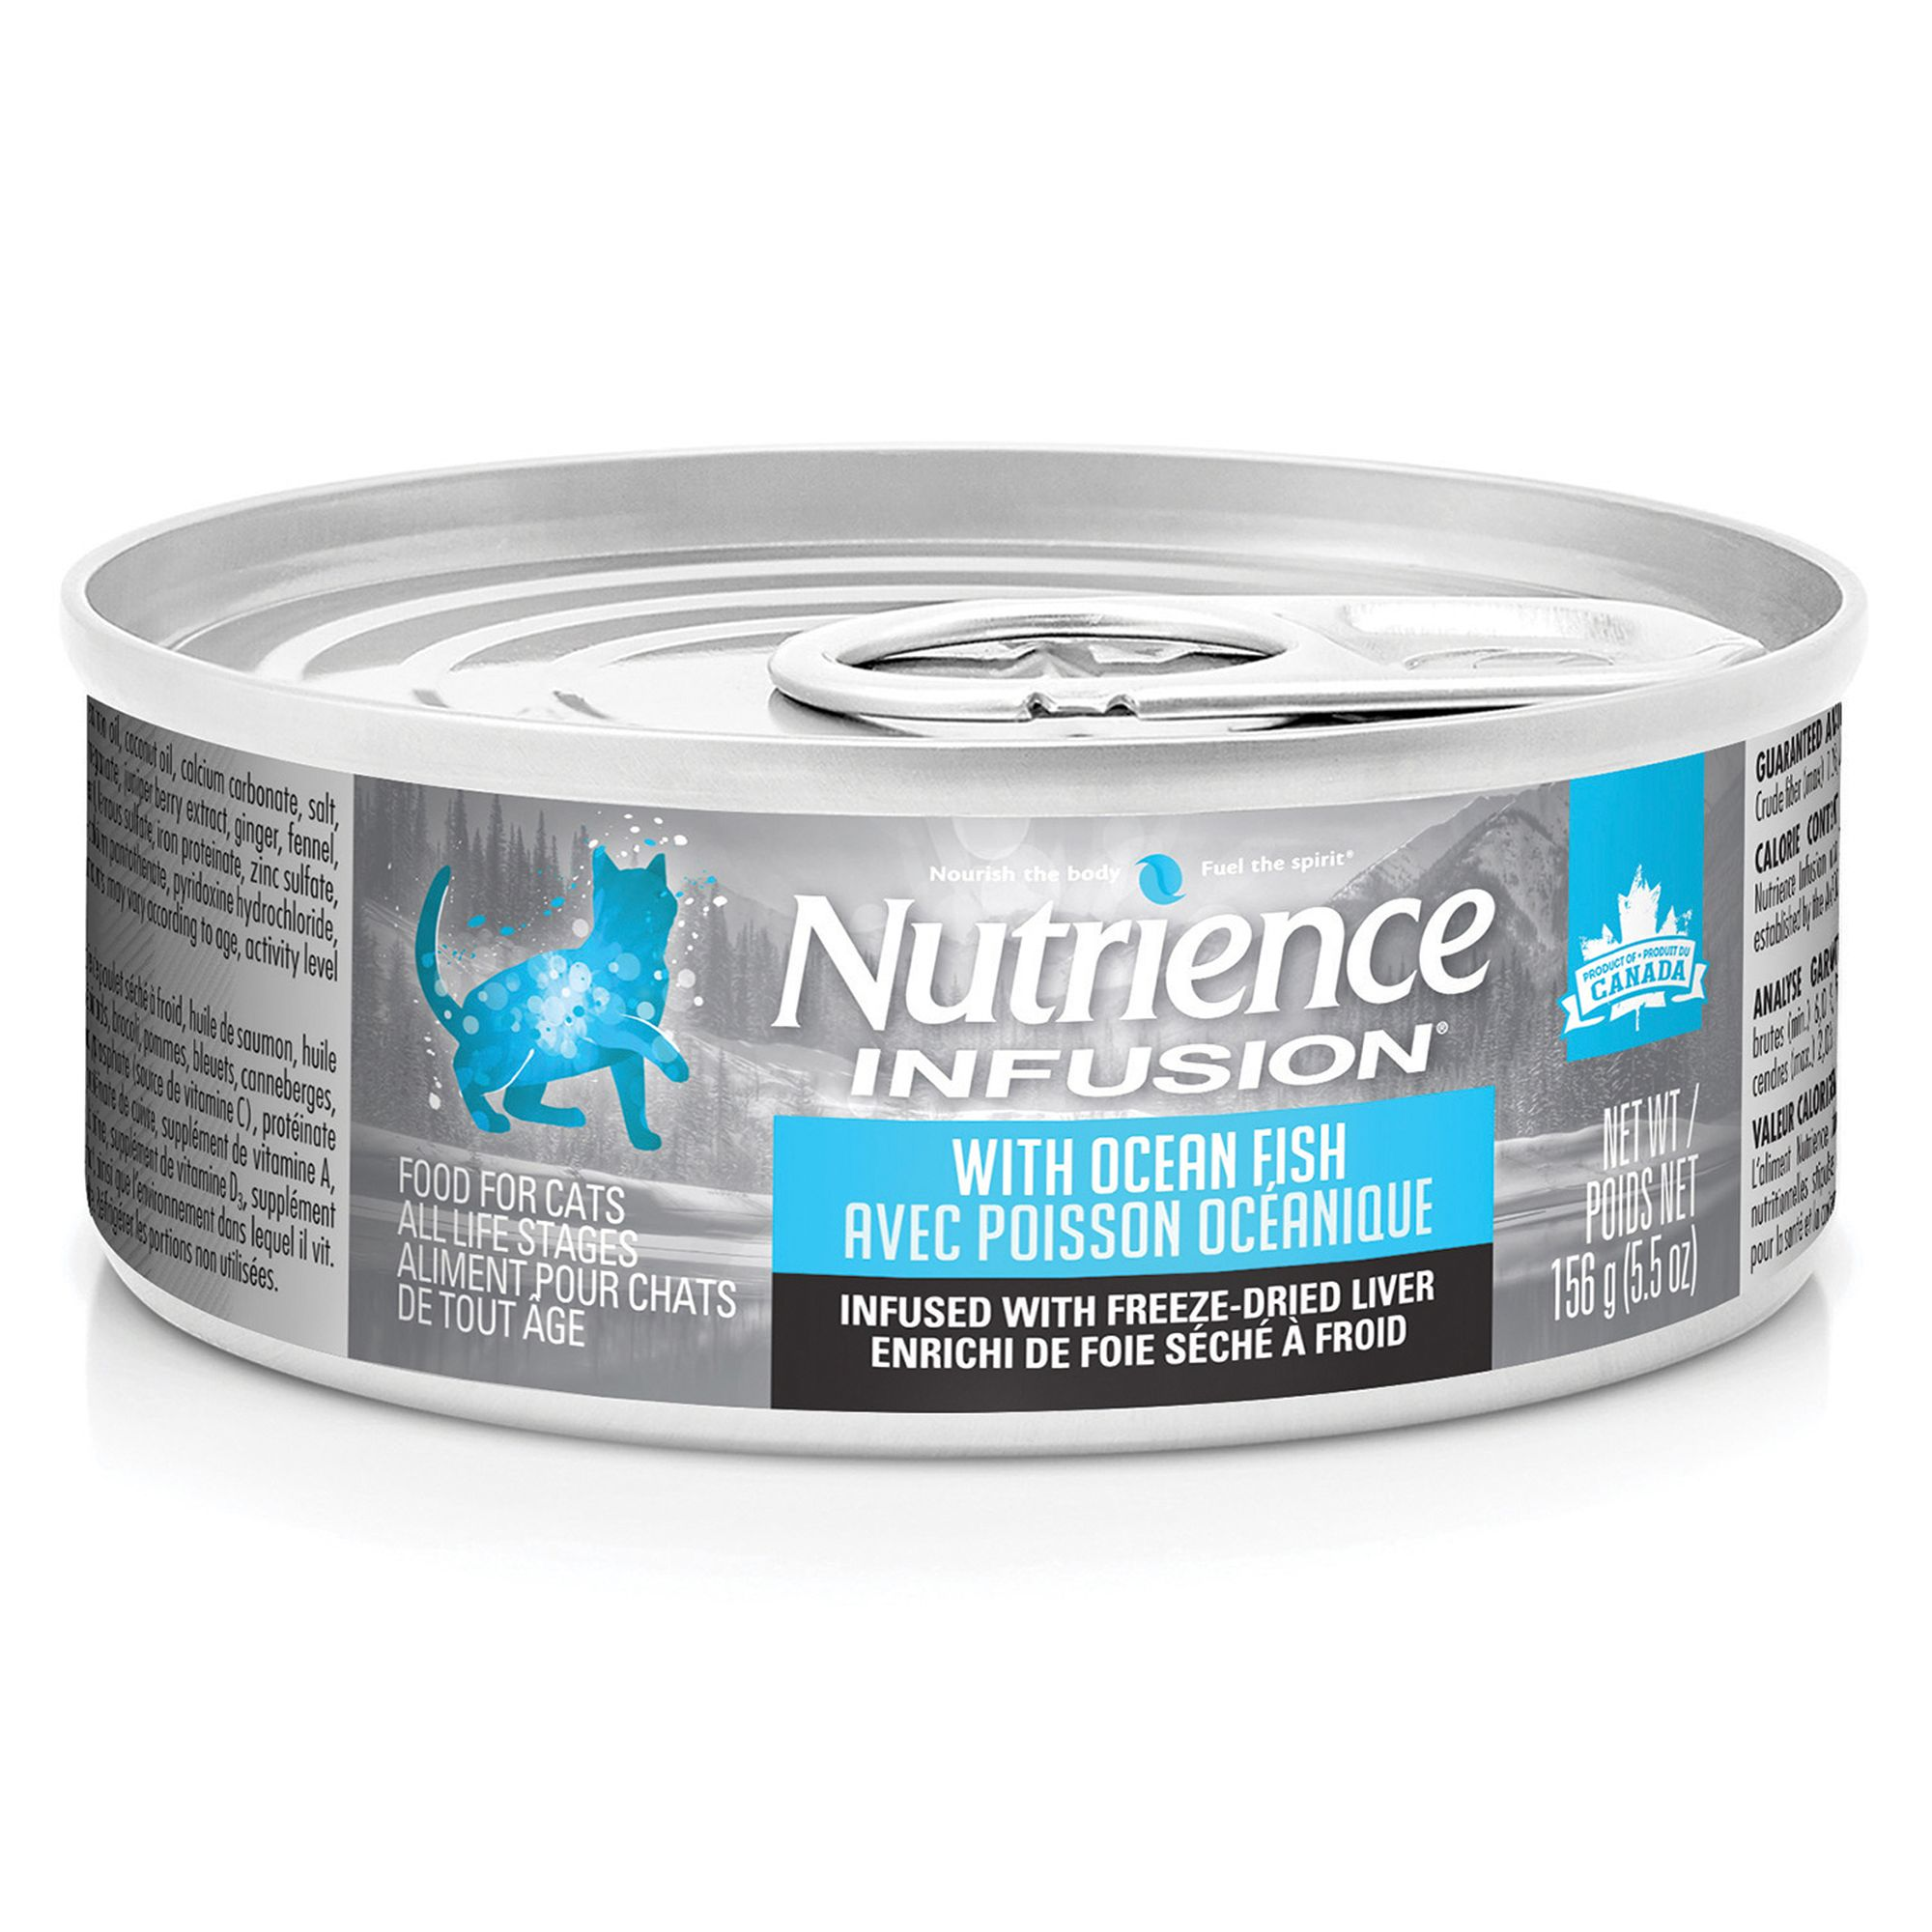 Nutrience Infusion Adult Cat Food - Ocean Fish